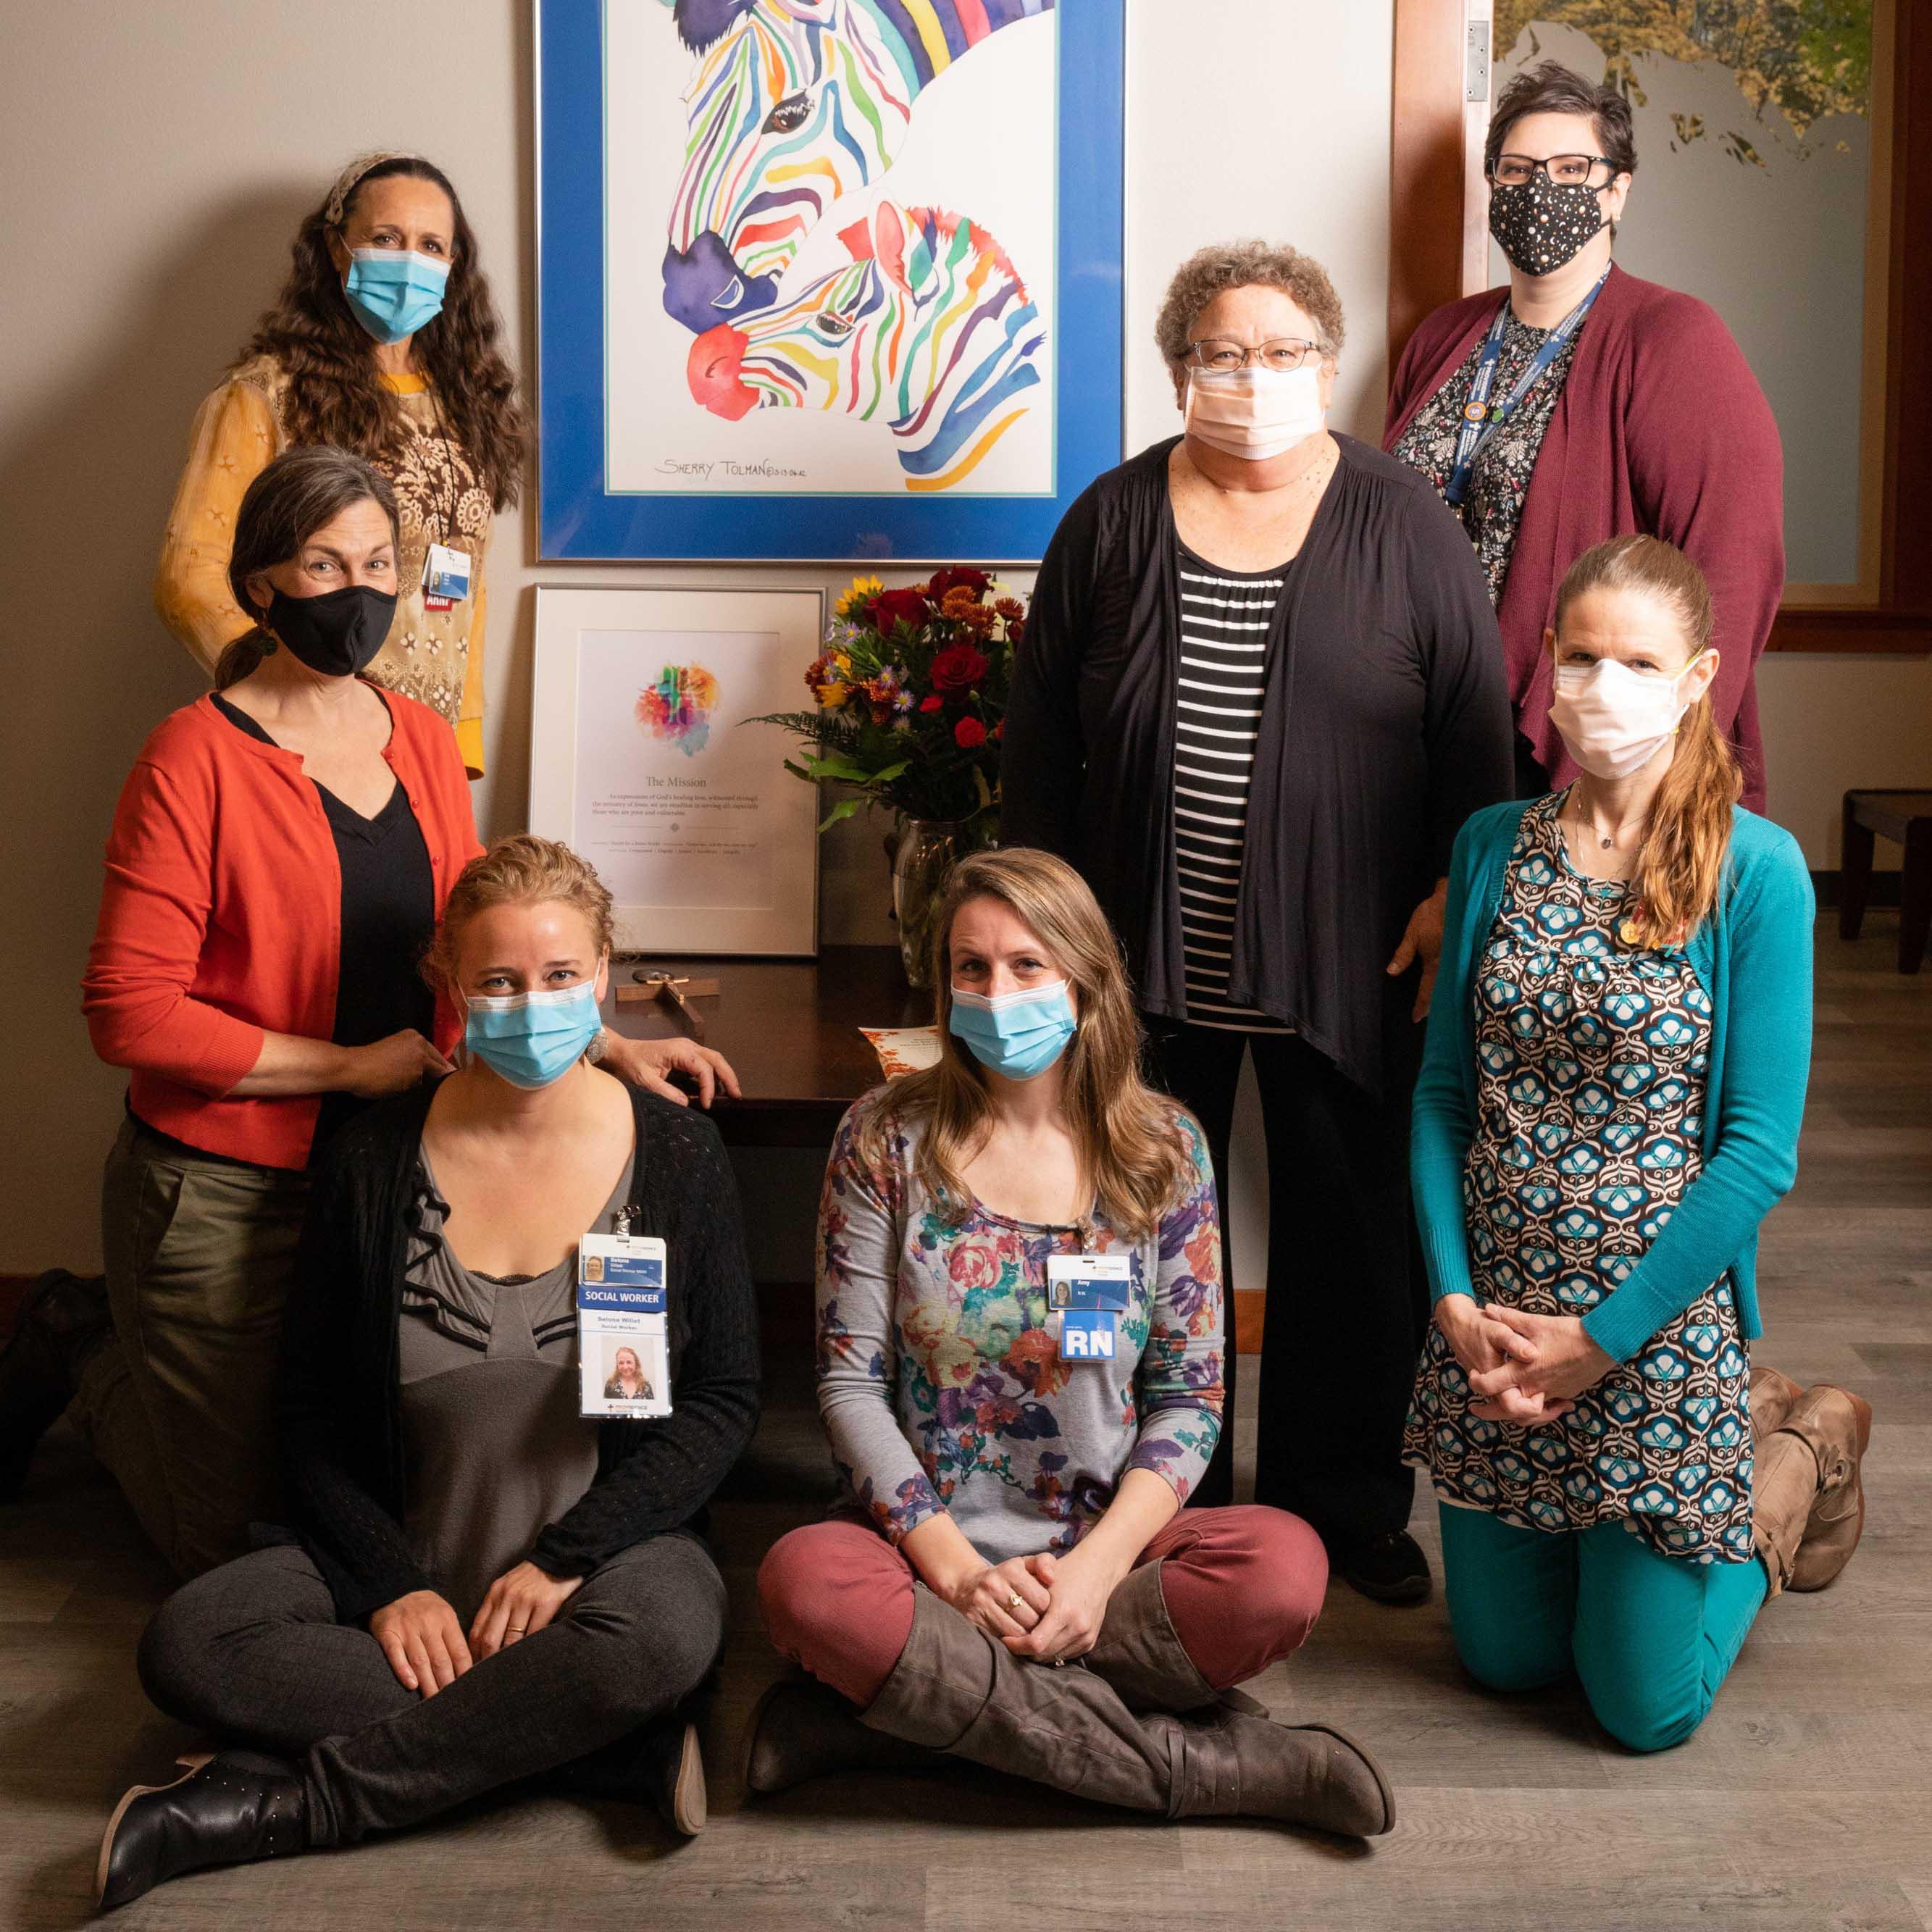 From left to right: Lisa Wahl, Tina Olson, Selona Willett, Amy Kummer, Heather McLeod, Joyce Gilbert, Jennifer Holmes.